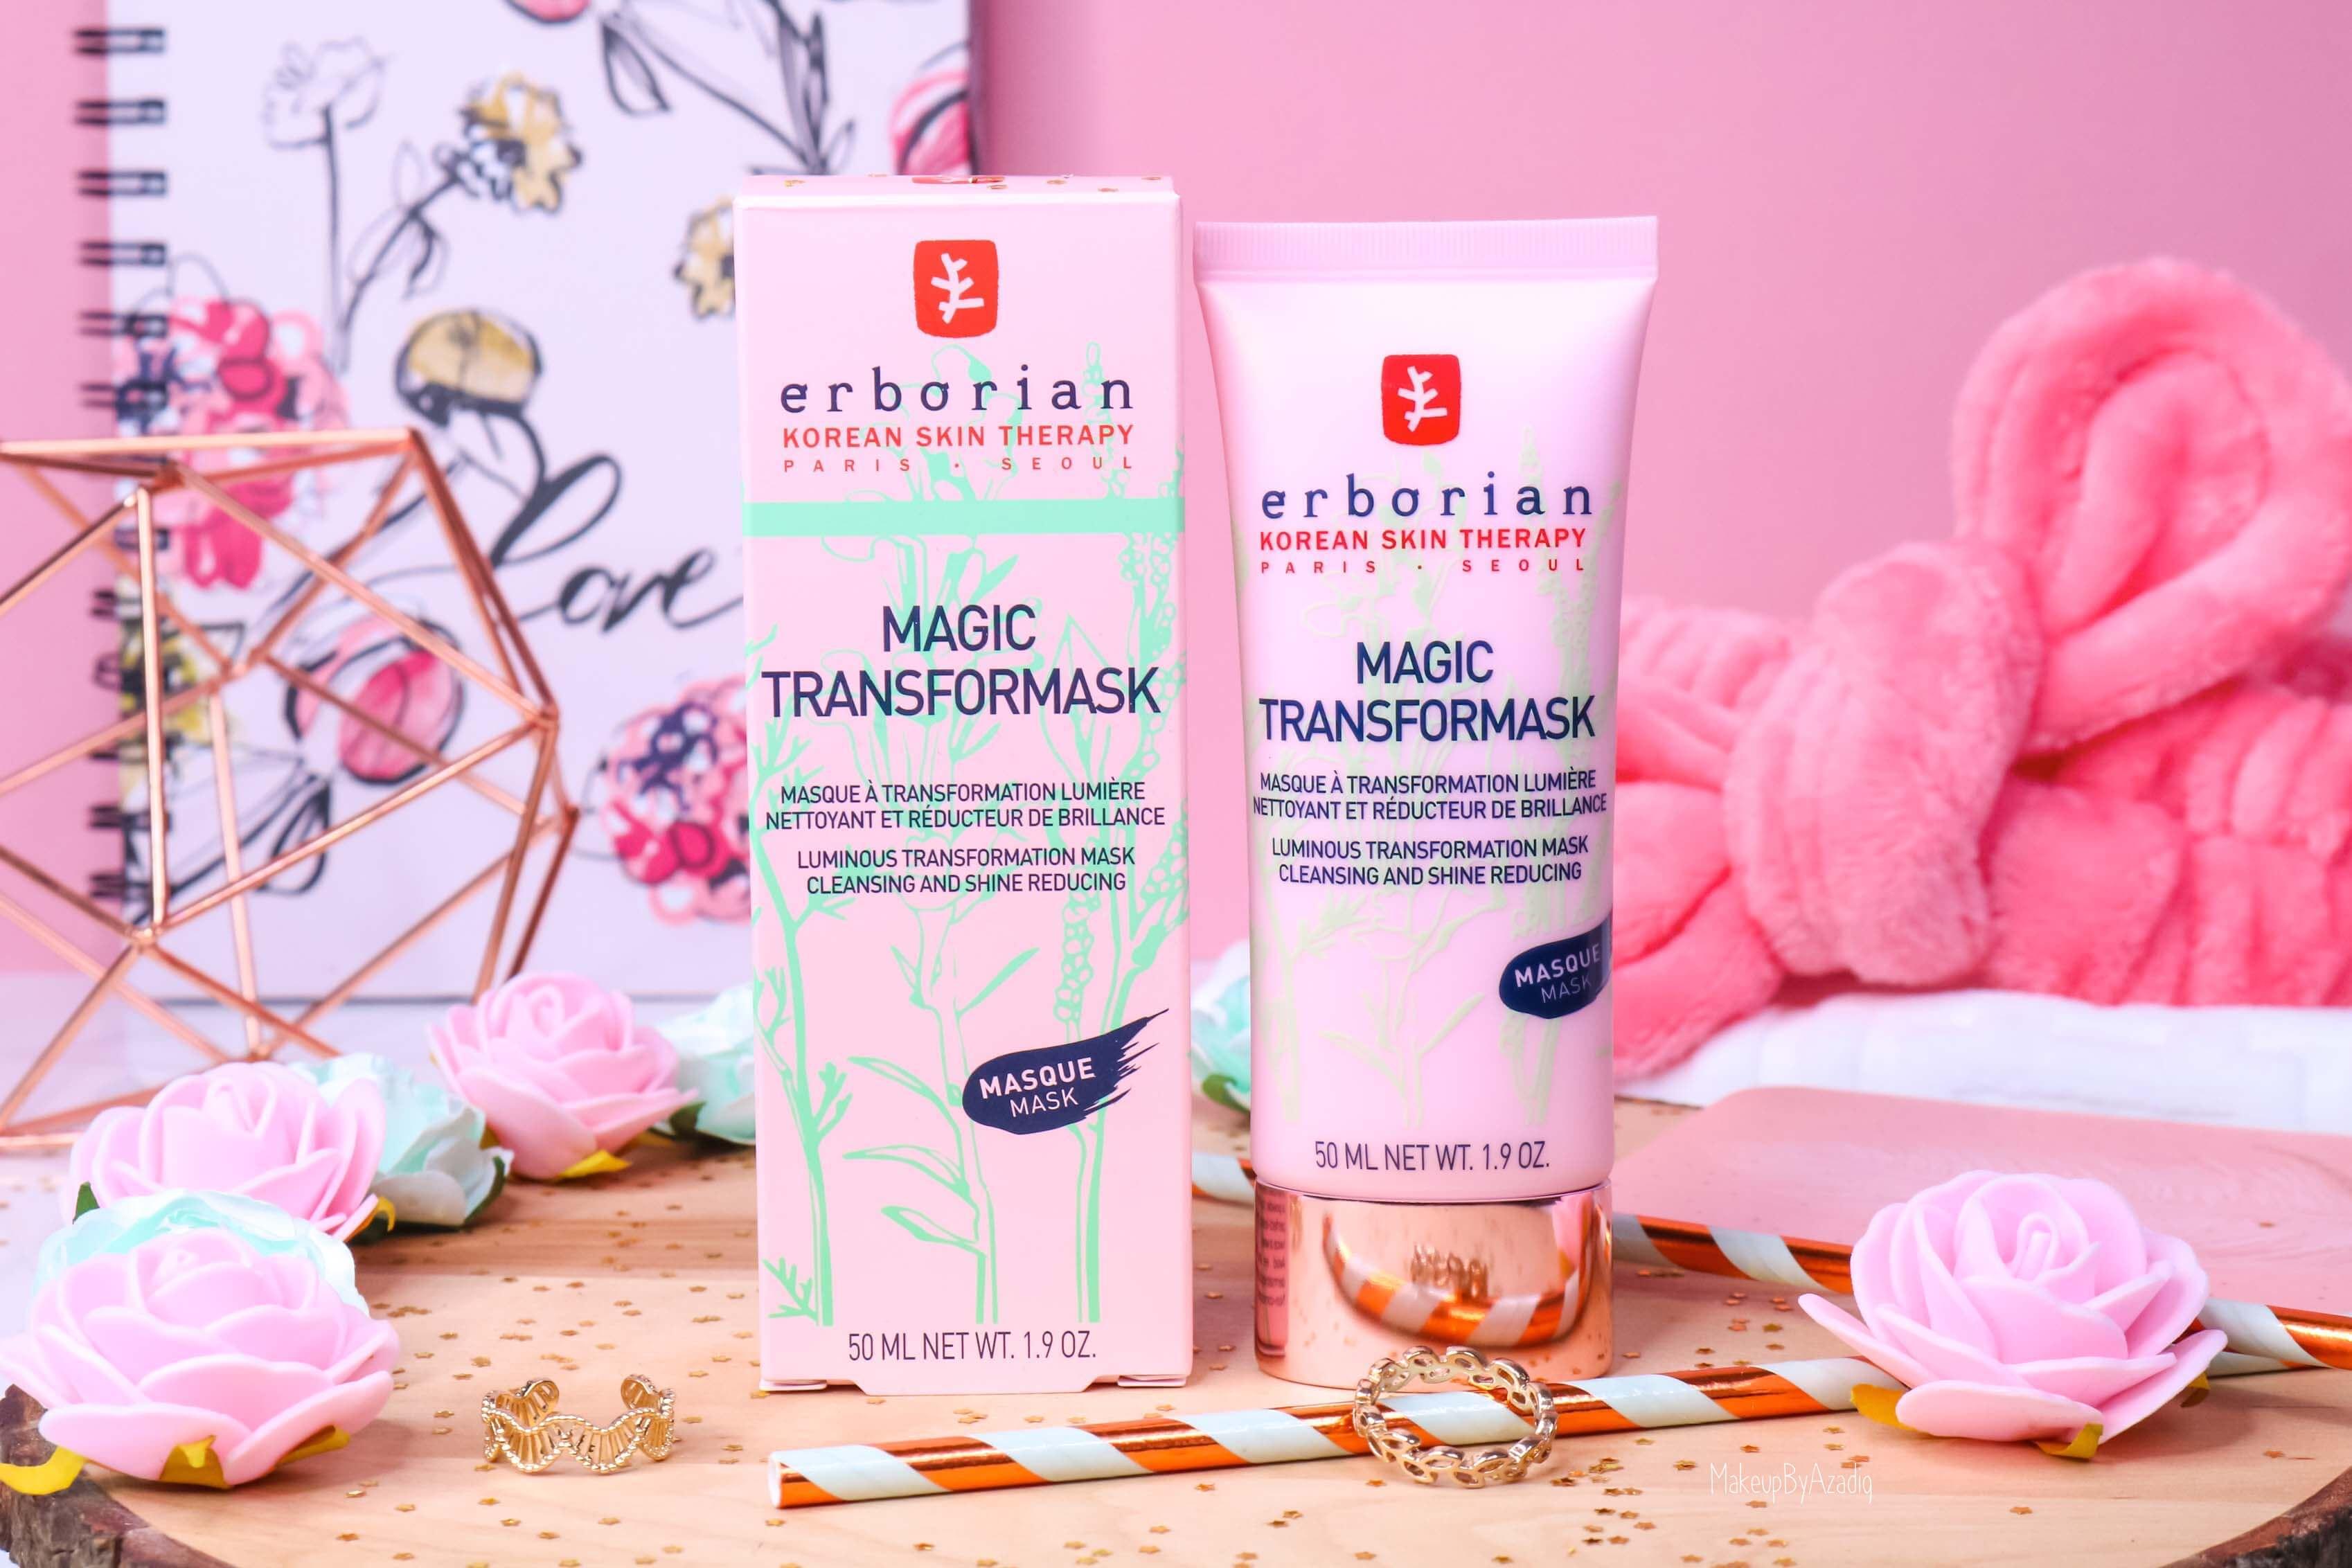 revue-magic-transformask-erborian-masque-visage-rose-sephora-avis-prix-makeupbyazadig-korean-partenariat